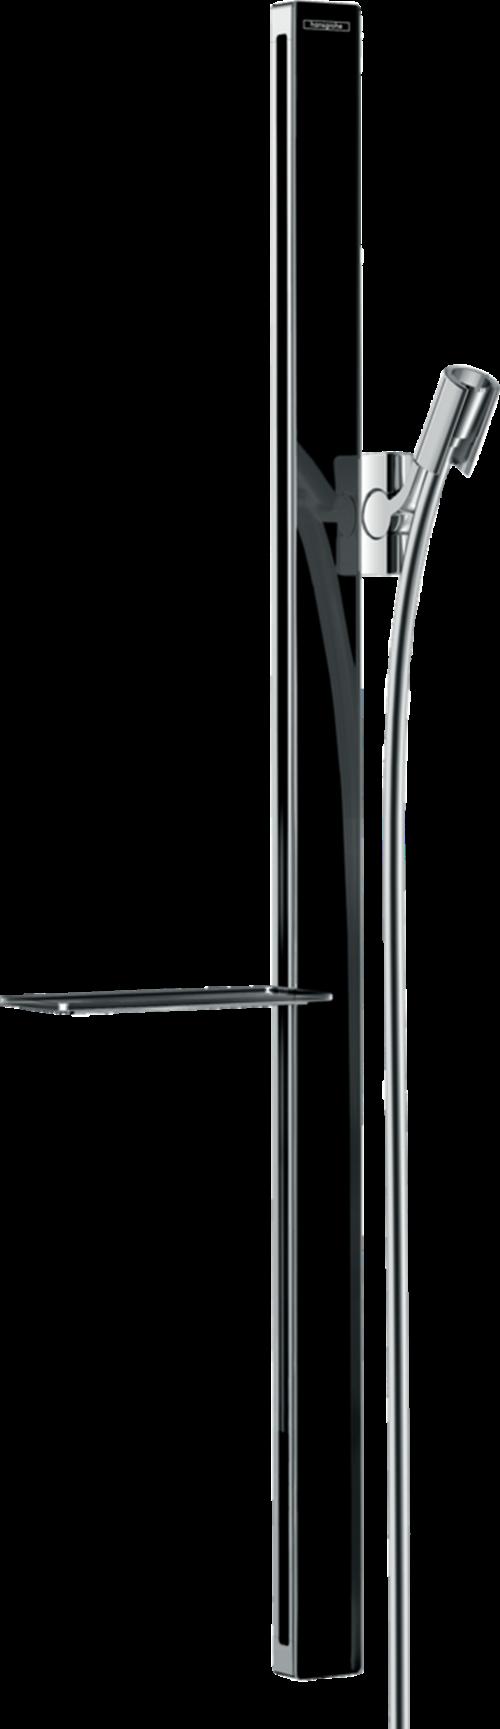 Hansgrohe Unica 27640600